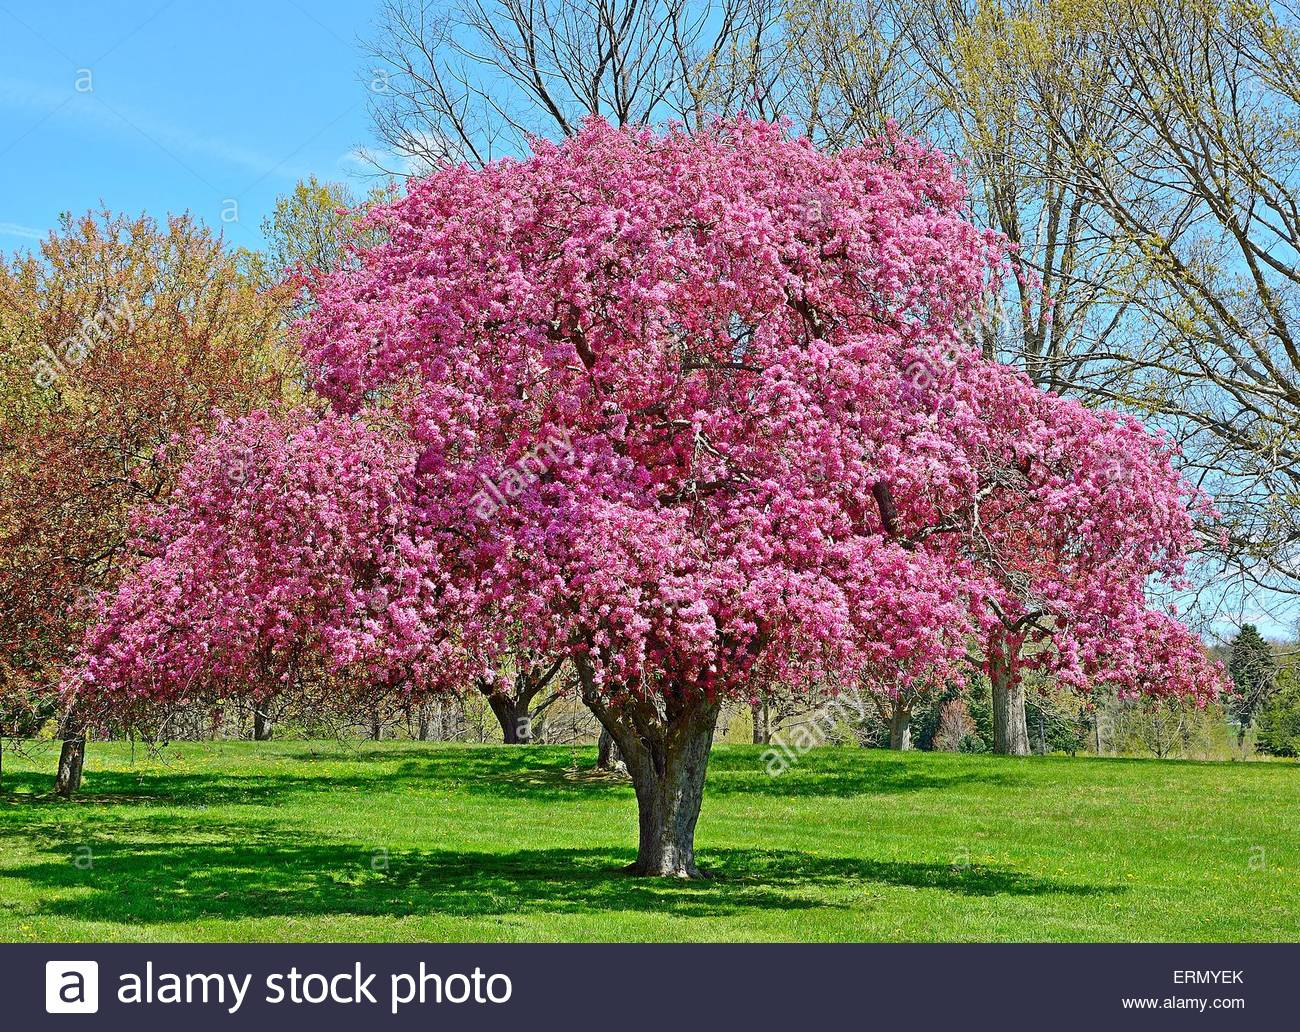 Flowering Crabapple Tree Stock Royalty Free Image Alamy